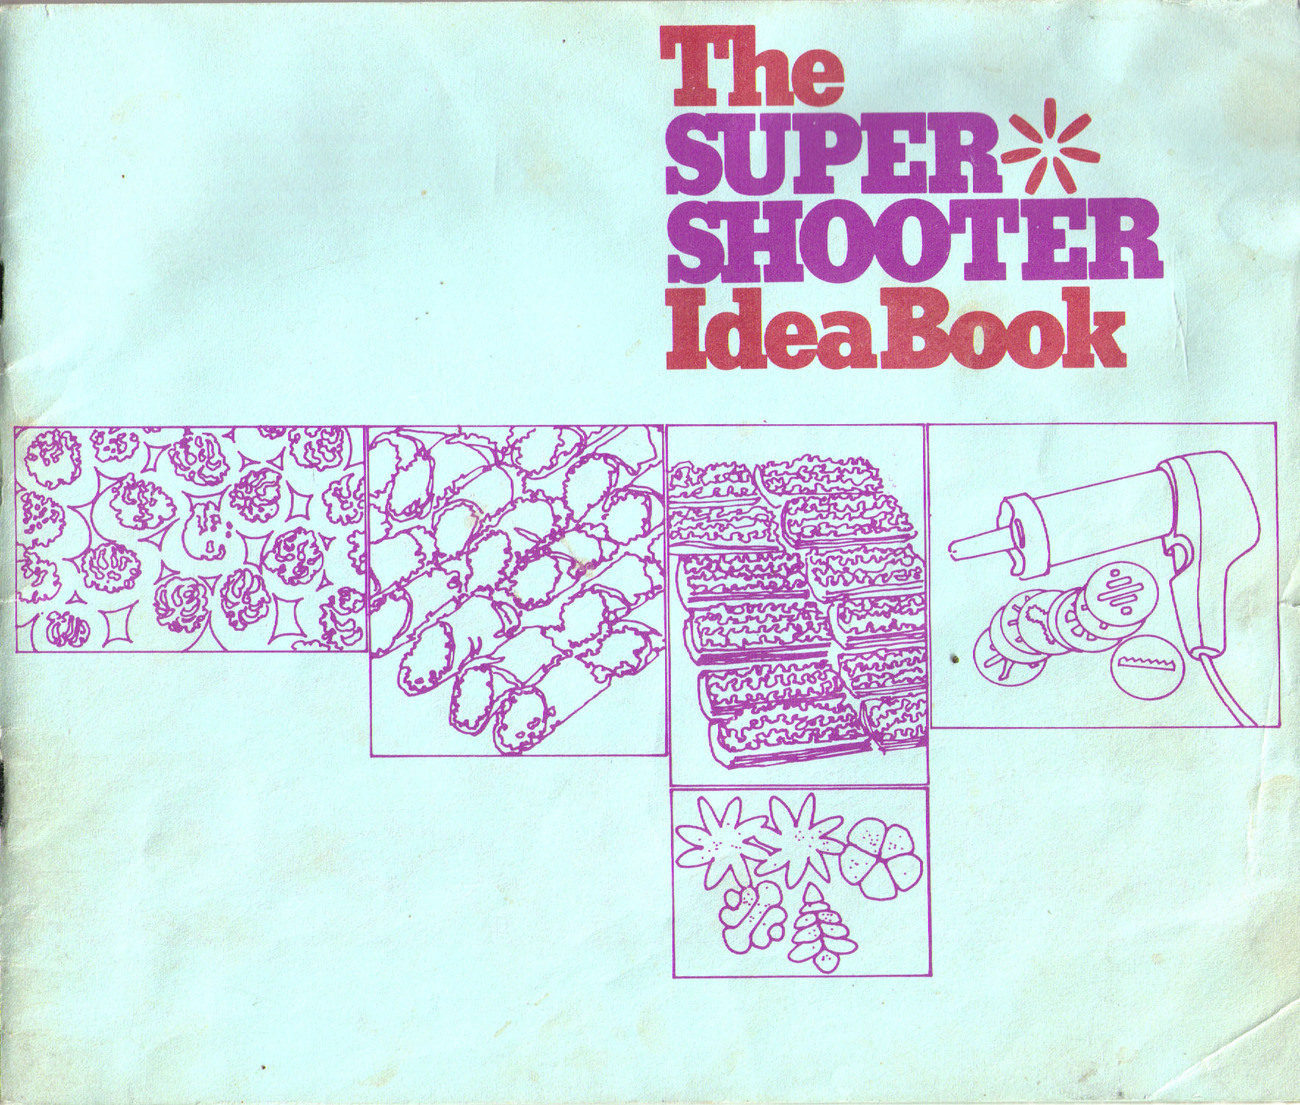 Supershooterideabook